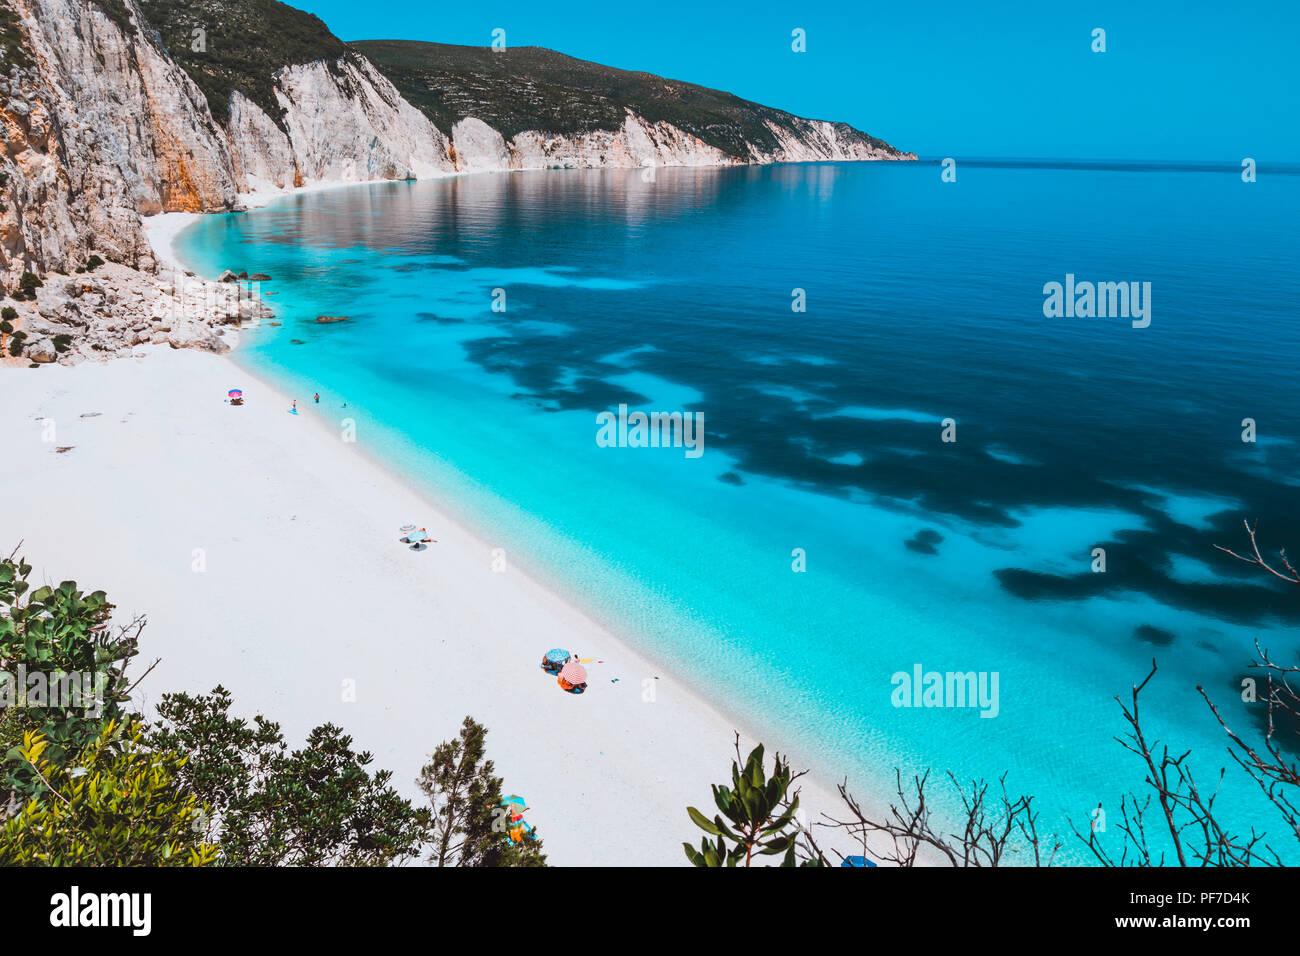 Sunny idyllic Fteri beach lagoon with limestone rocky coastline, Kefalonia, Greece. Tourists relax under umbrella near clear blue emerald turquoise sea water with dark pattern on bottom Stock Photo